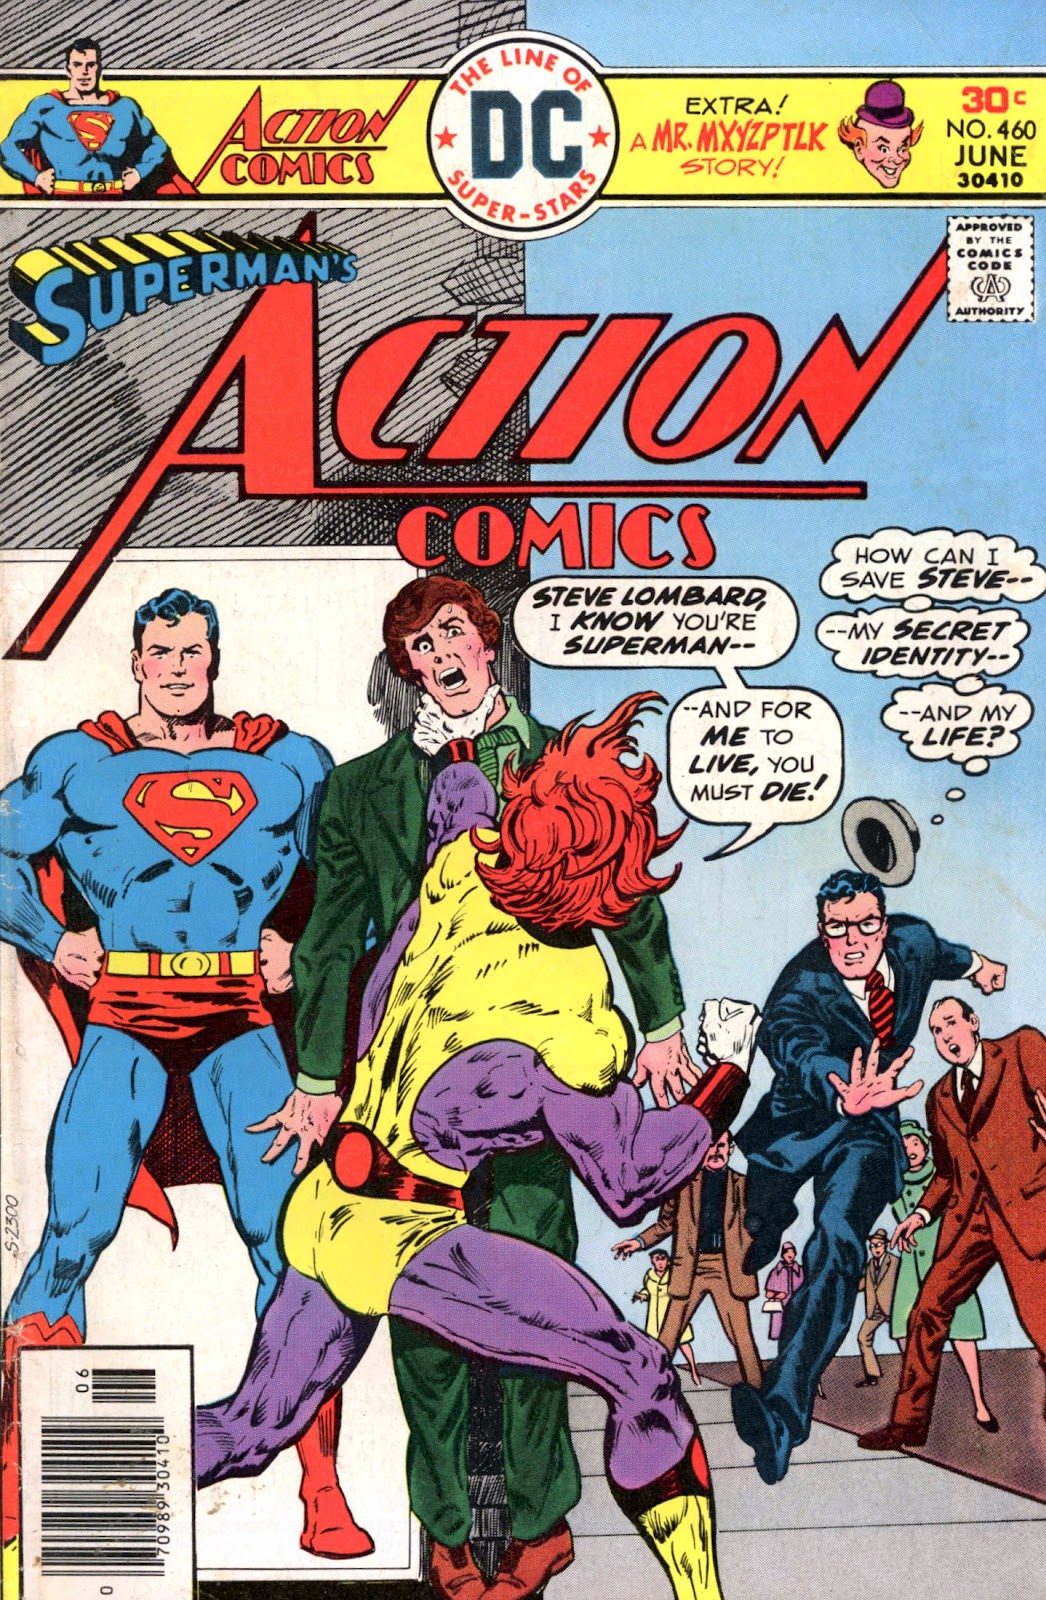 Action Comics (1938) 460 Page 1